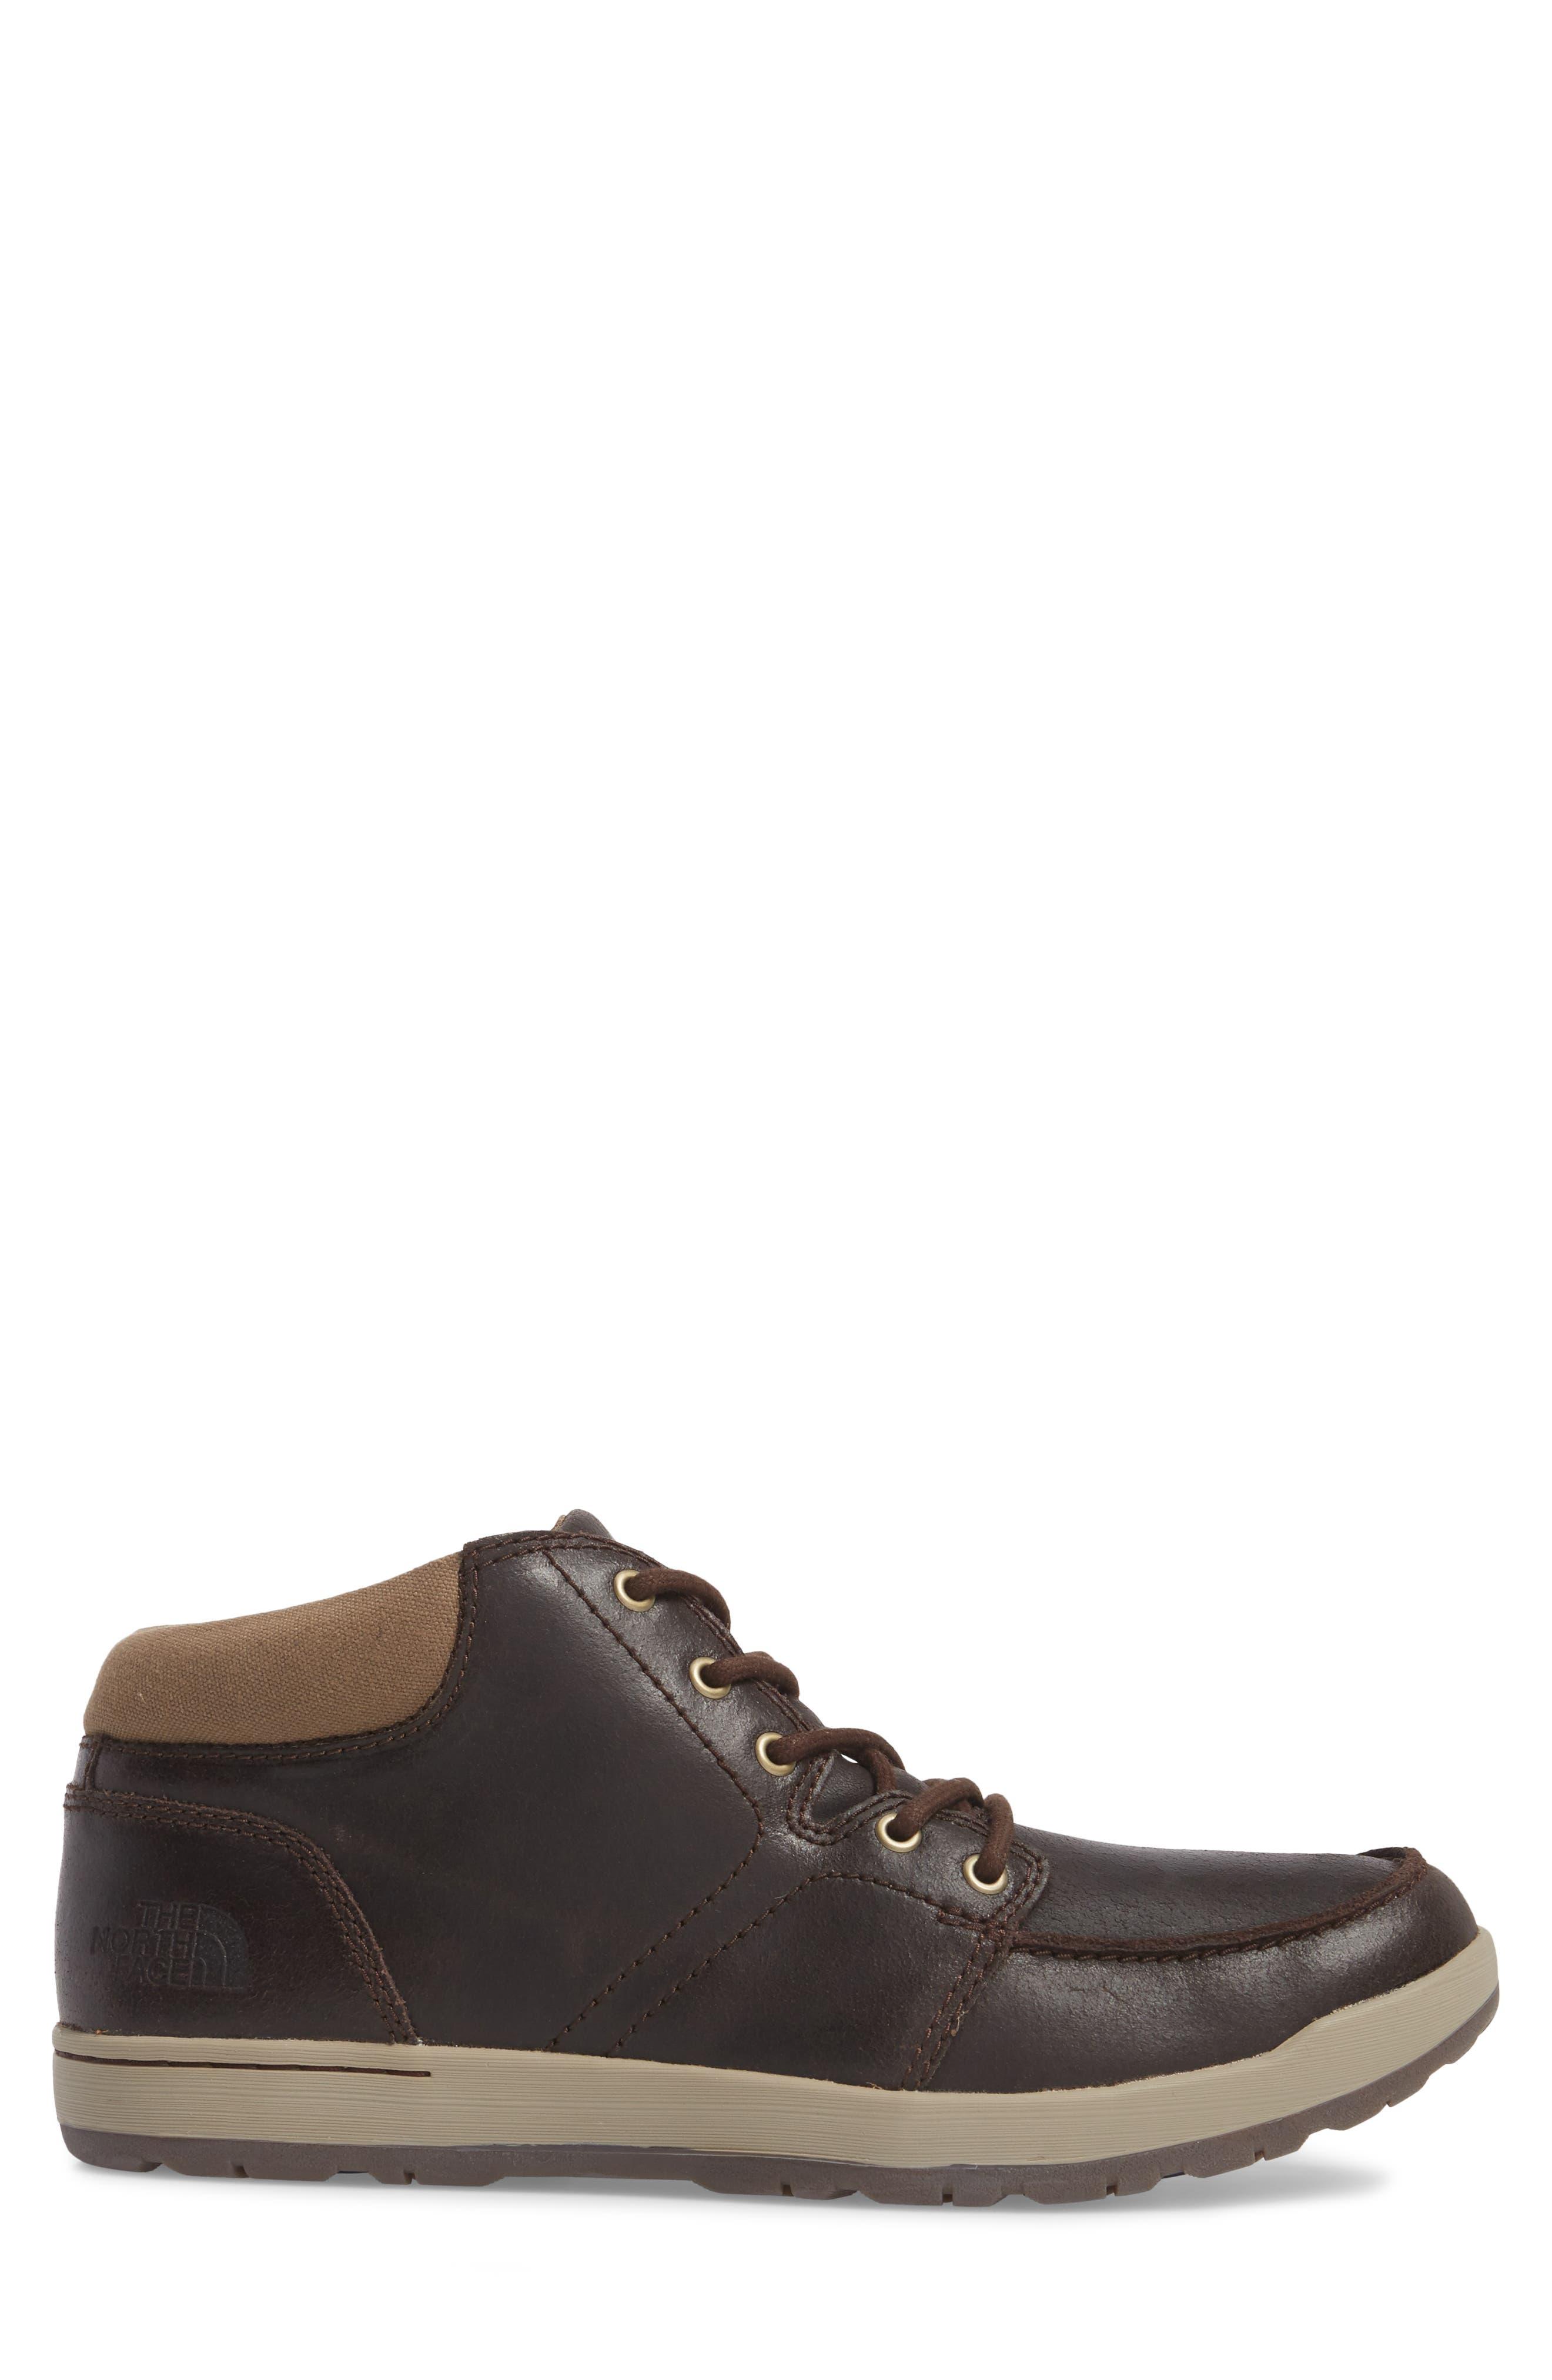 Alternate Image 3  - The North Face Ballard Evo Moc Toe Boot (Men)